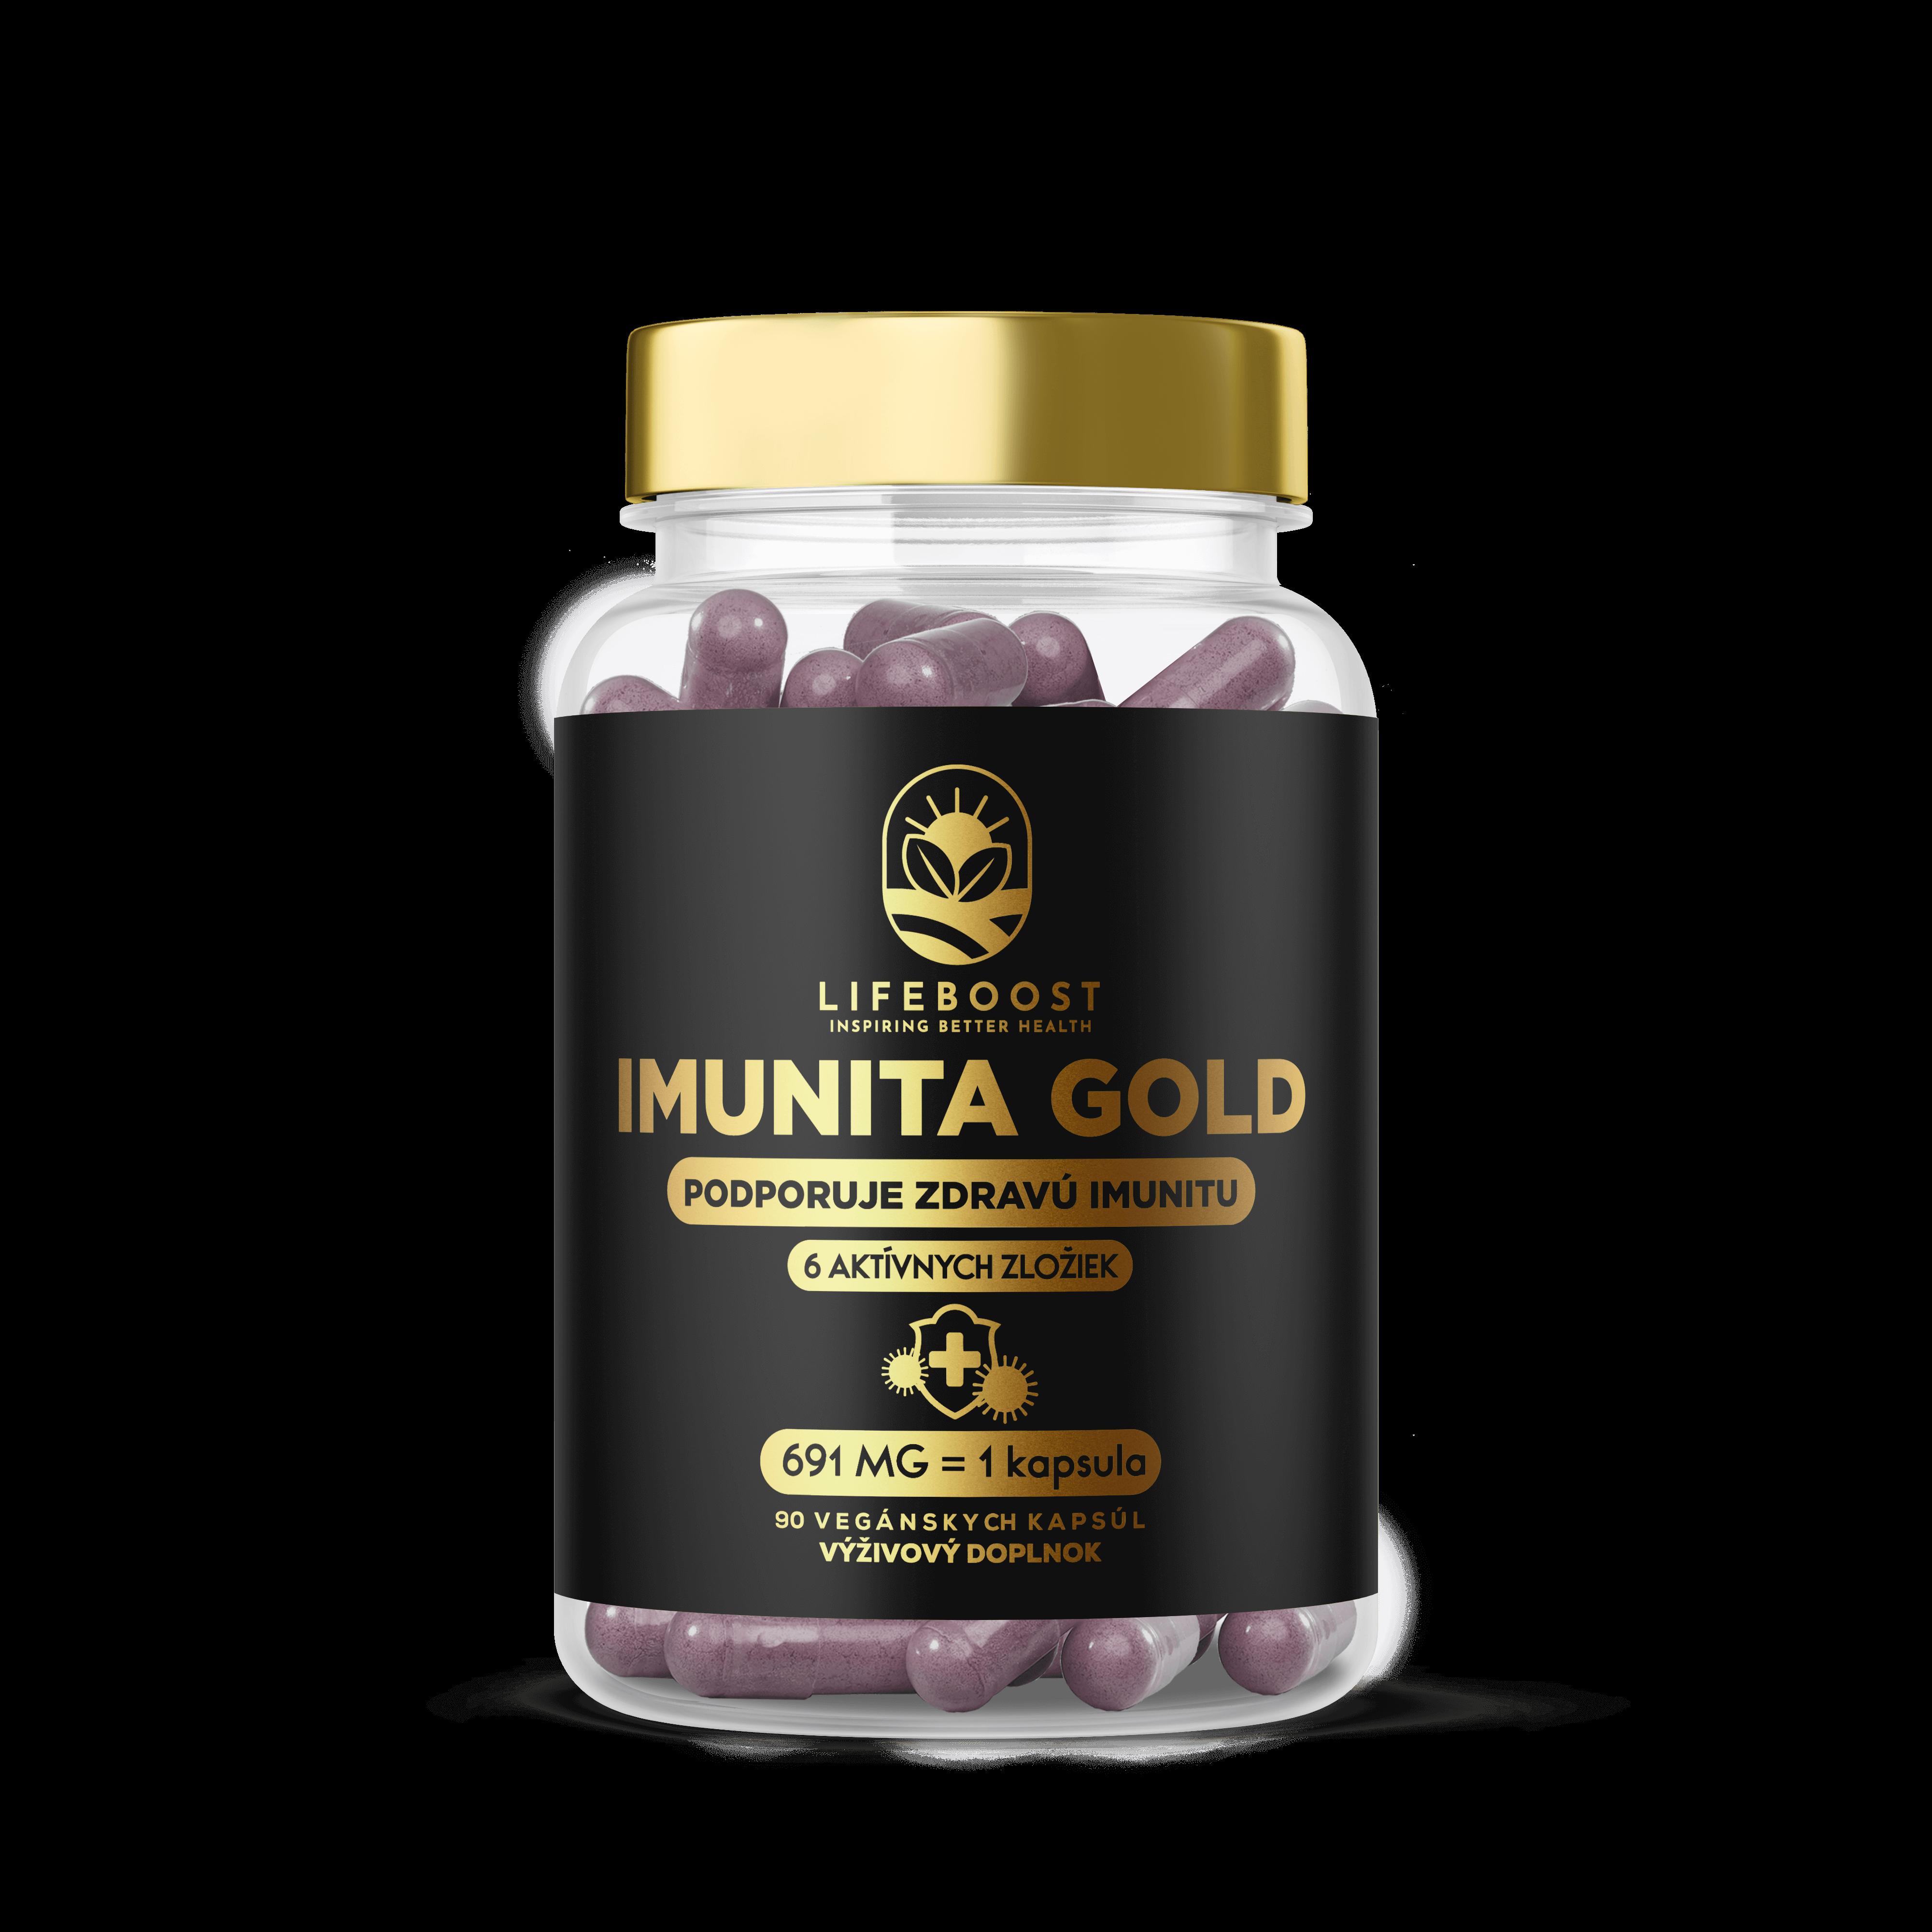 LIFEBOOST® IMUNITA GOLD